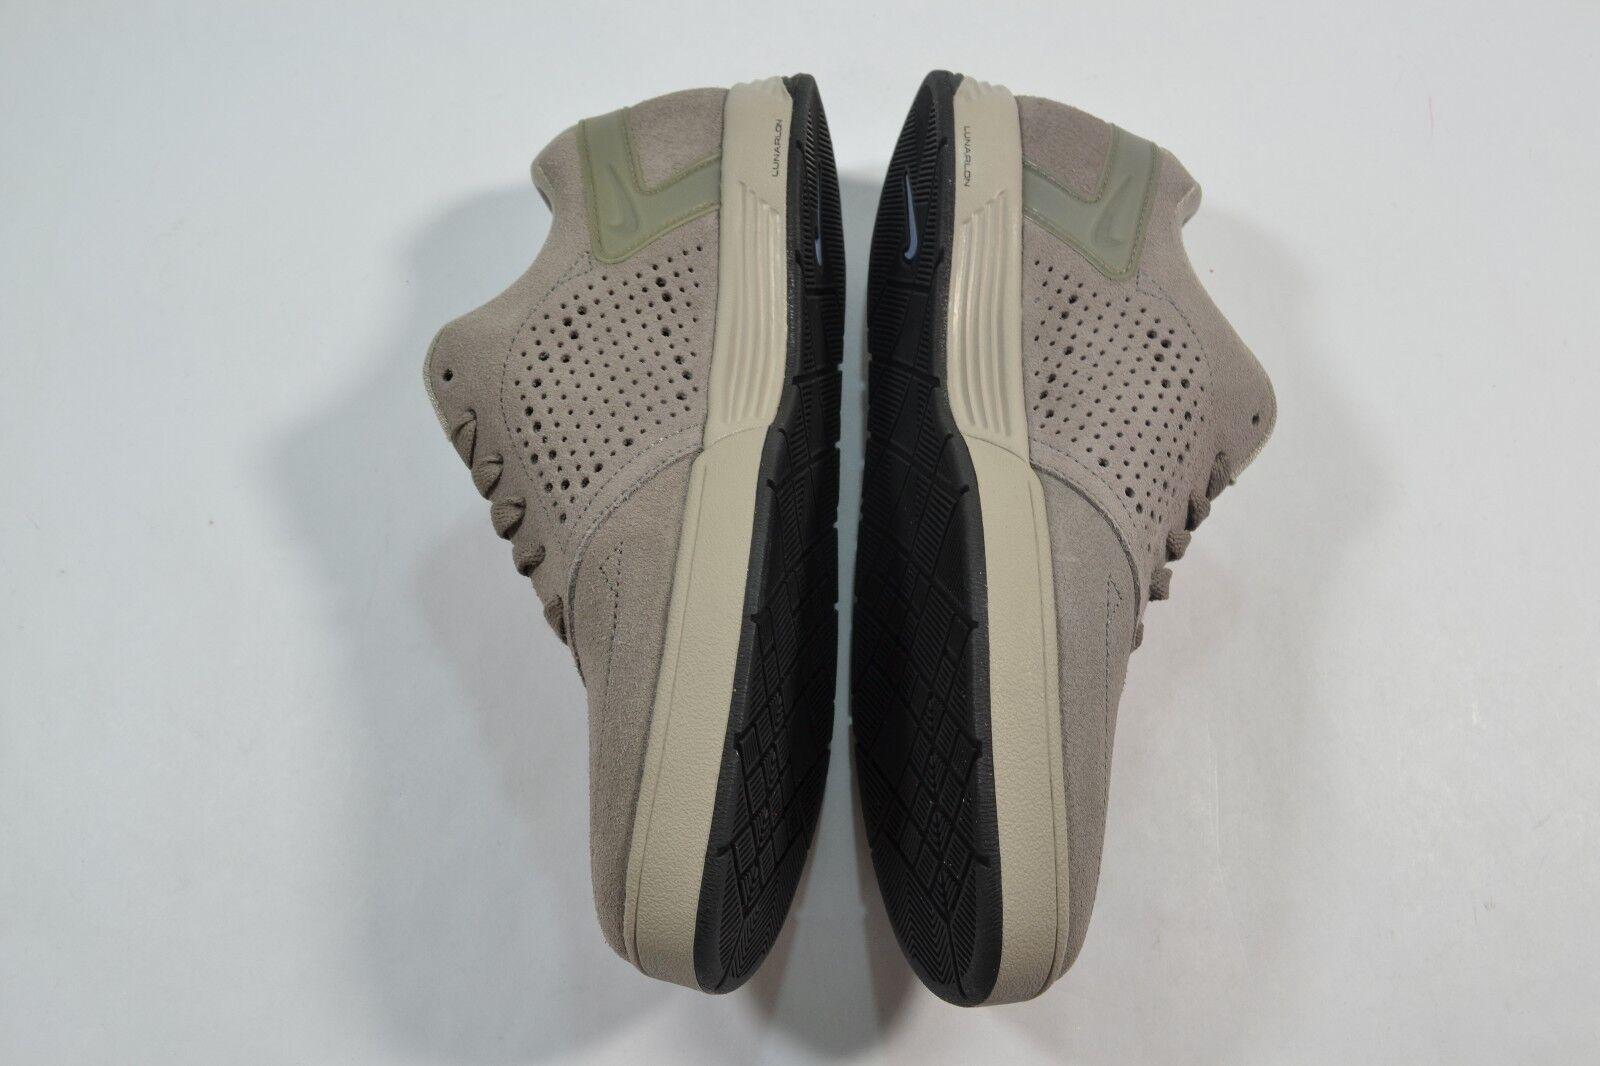 the latest d94bb 858ea ... Nike Nike Nike PAUL RODRIGUEZ 6 Soft Grey Work Blue Discounted (191)  Men s Shoes ...